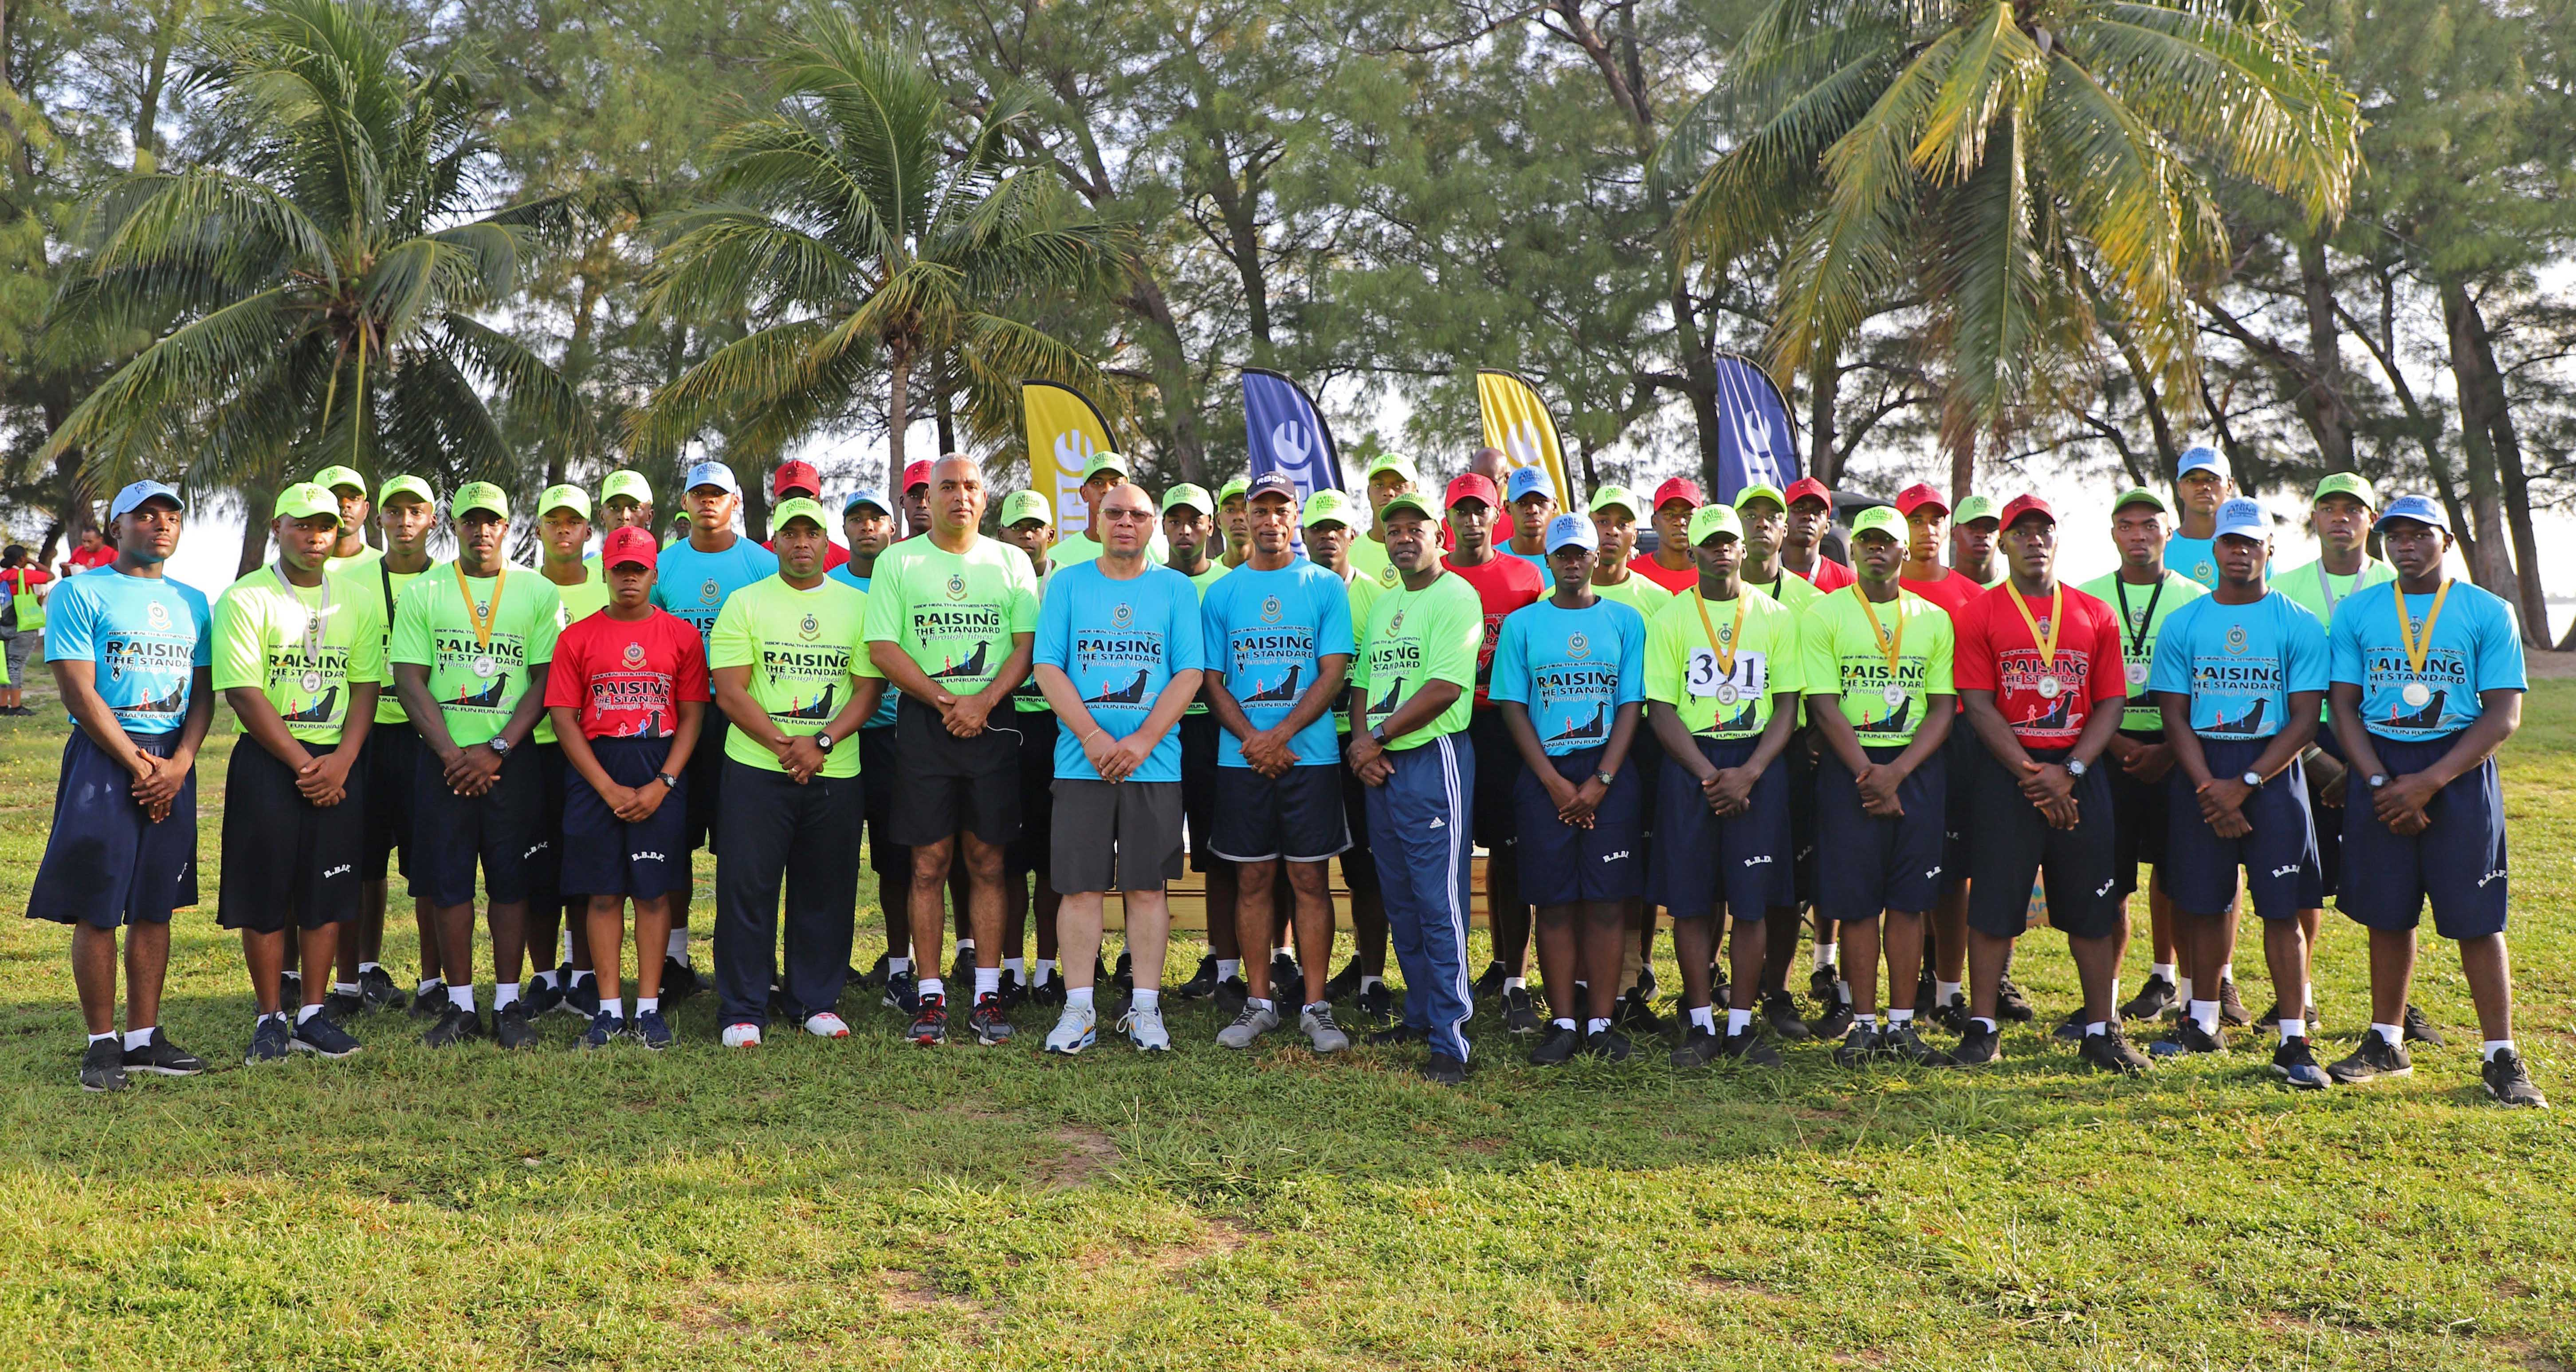 RBDF hosts fun run walk and health expo